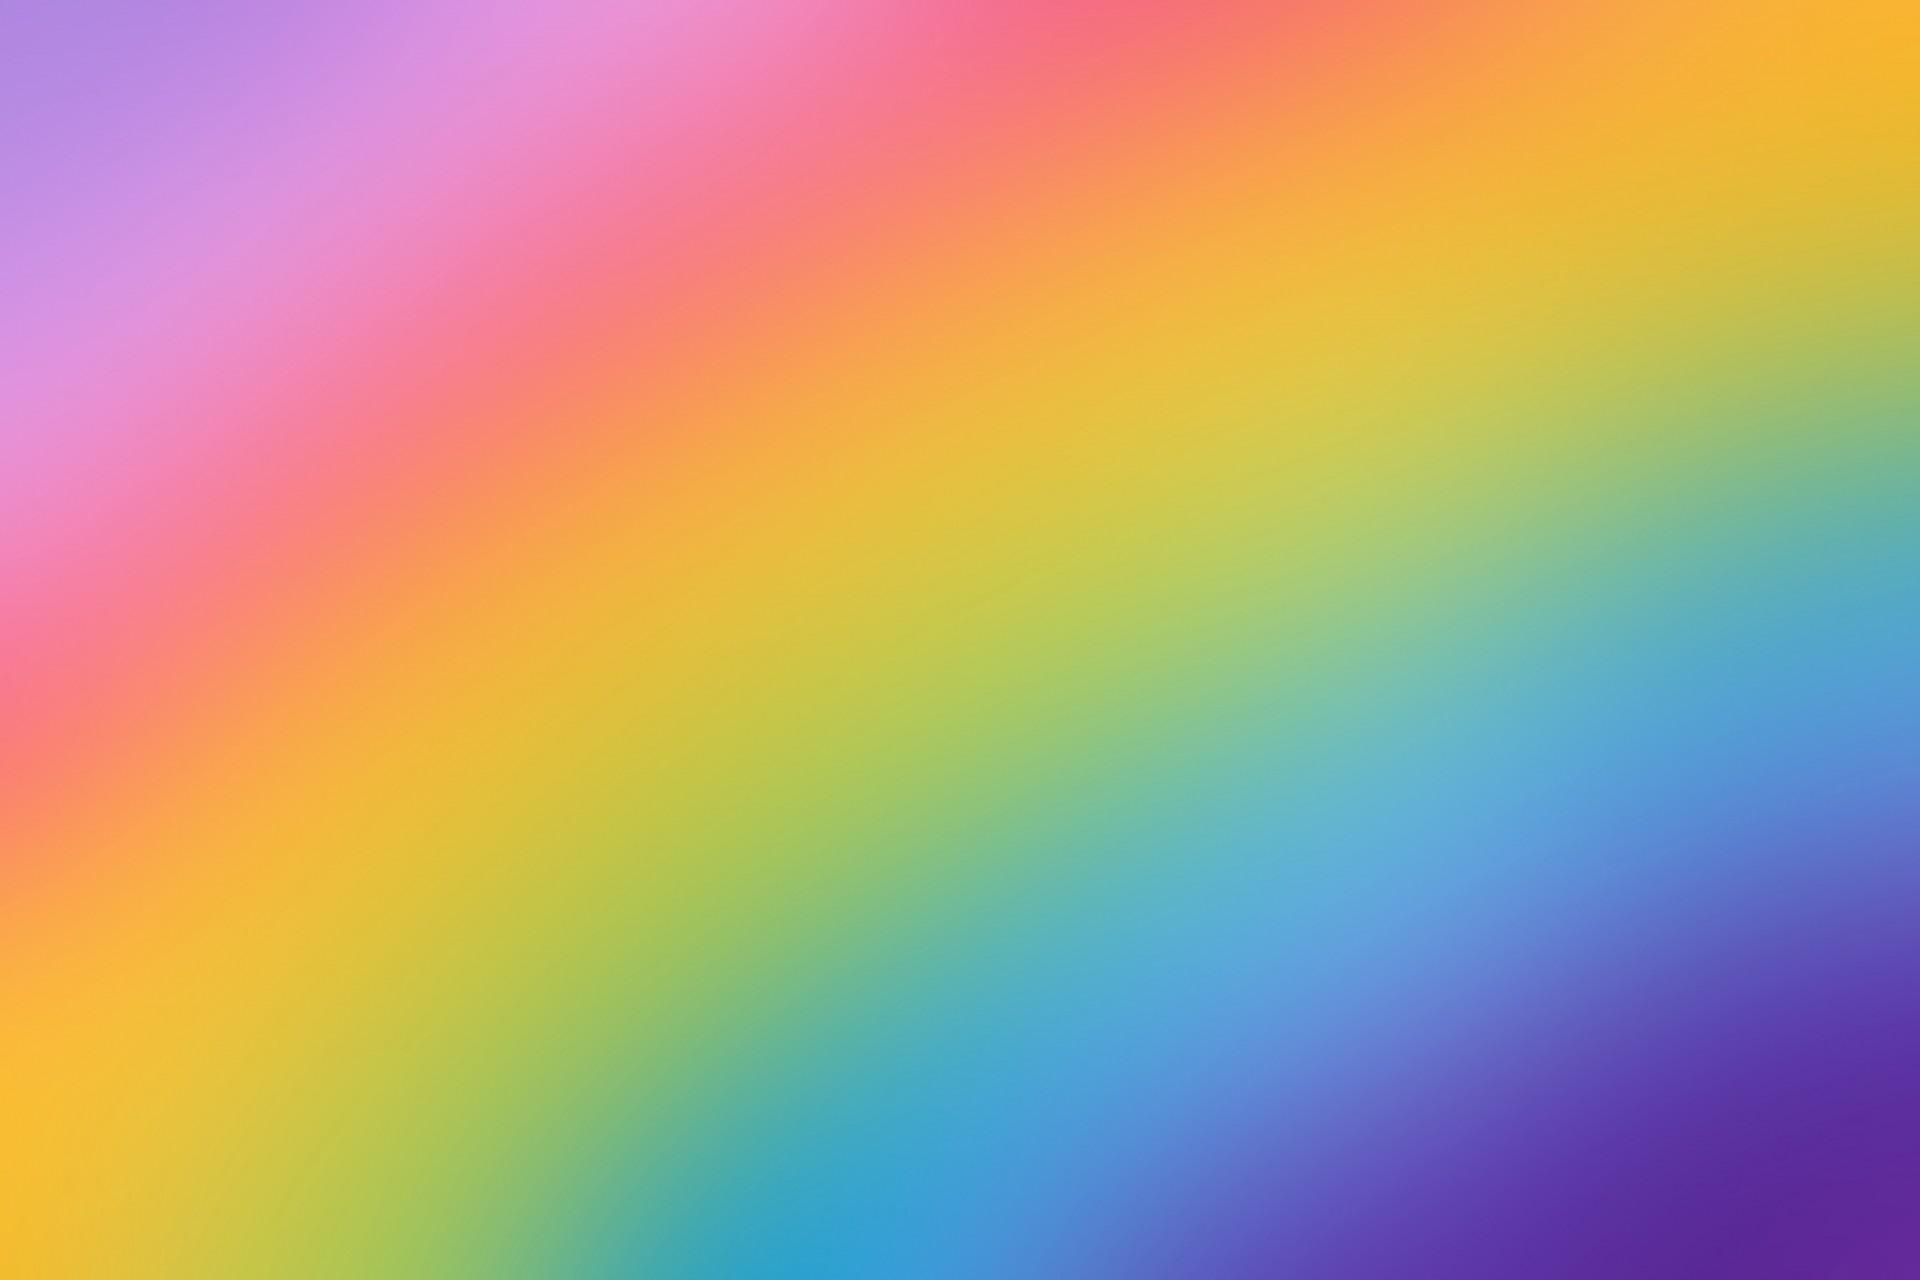 Rainbow Colors Background Free Stock Photo